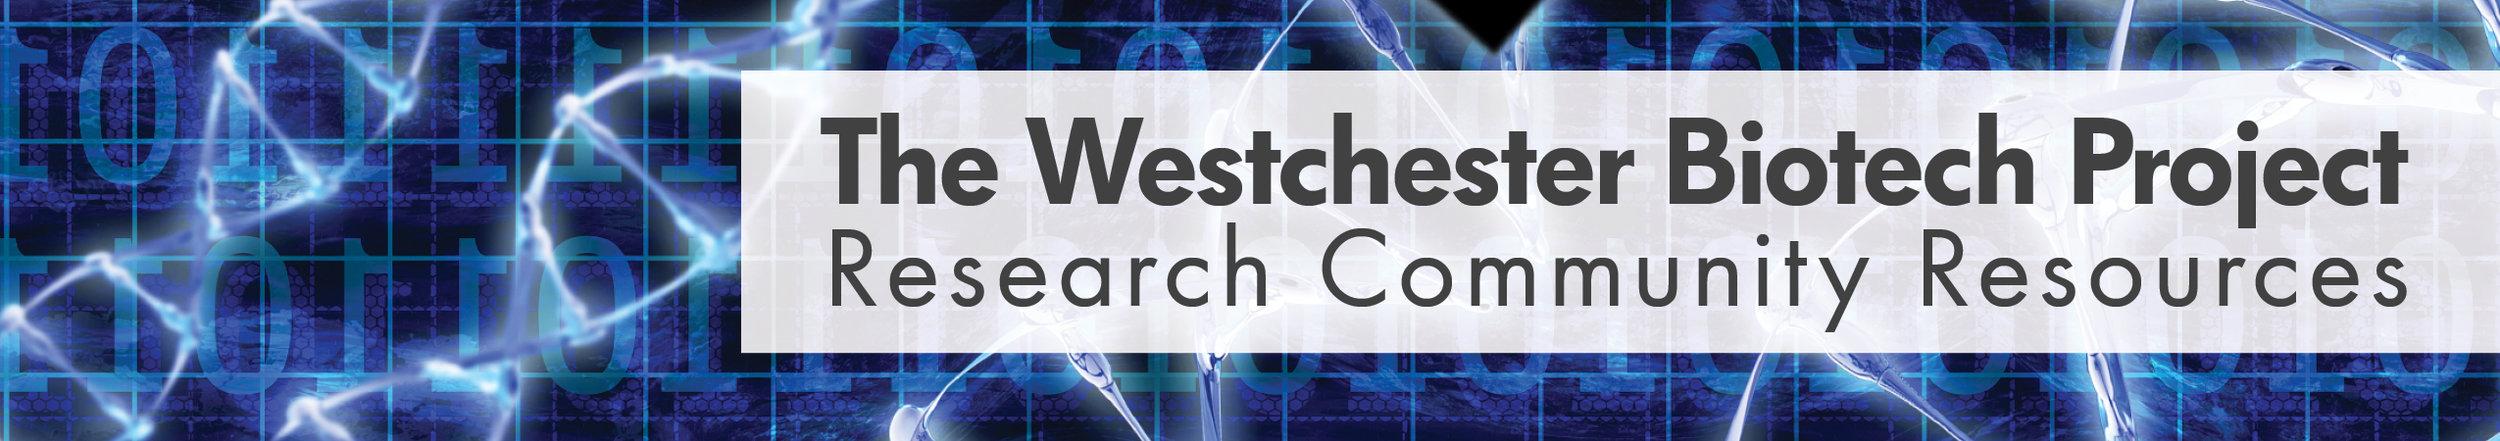 Westchester Biotech Project 2017.jpg